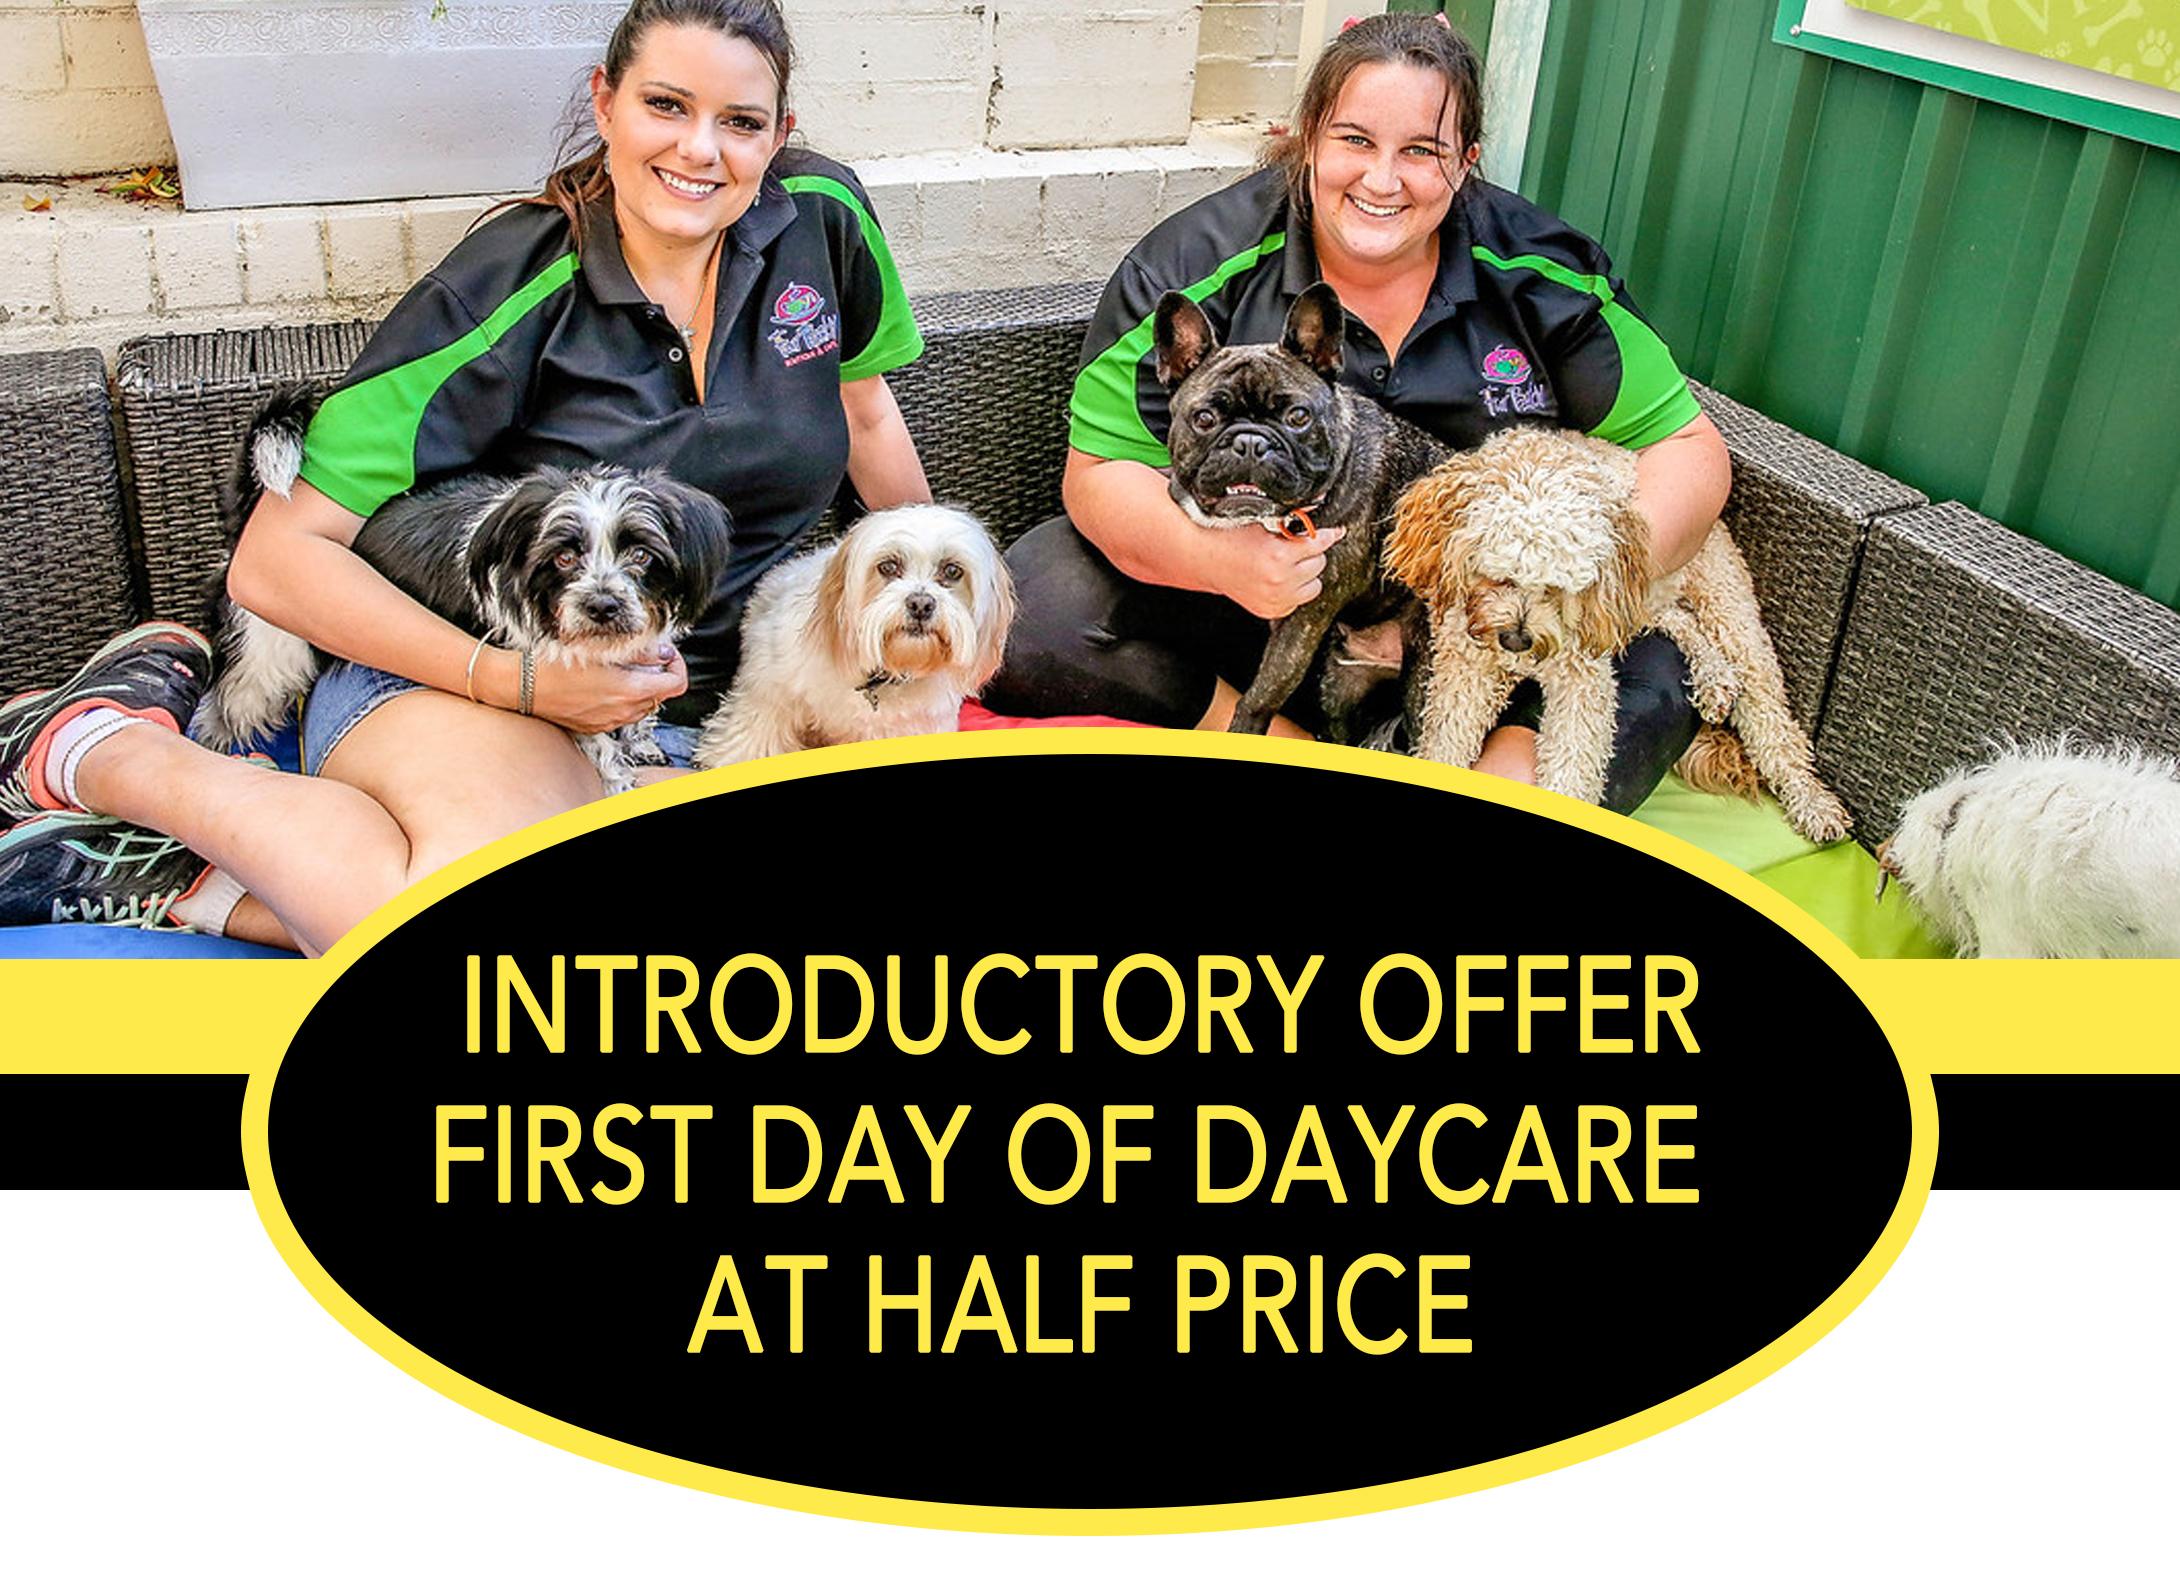 Daycare Offer Half Price